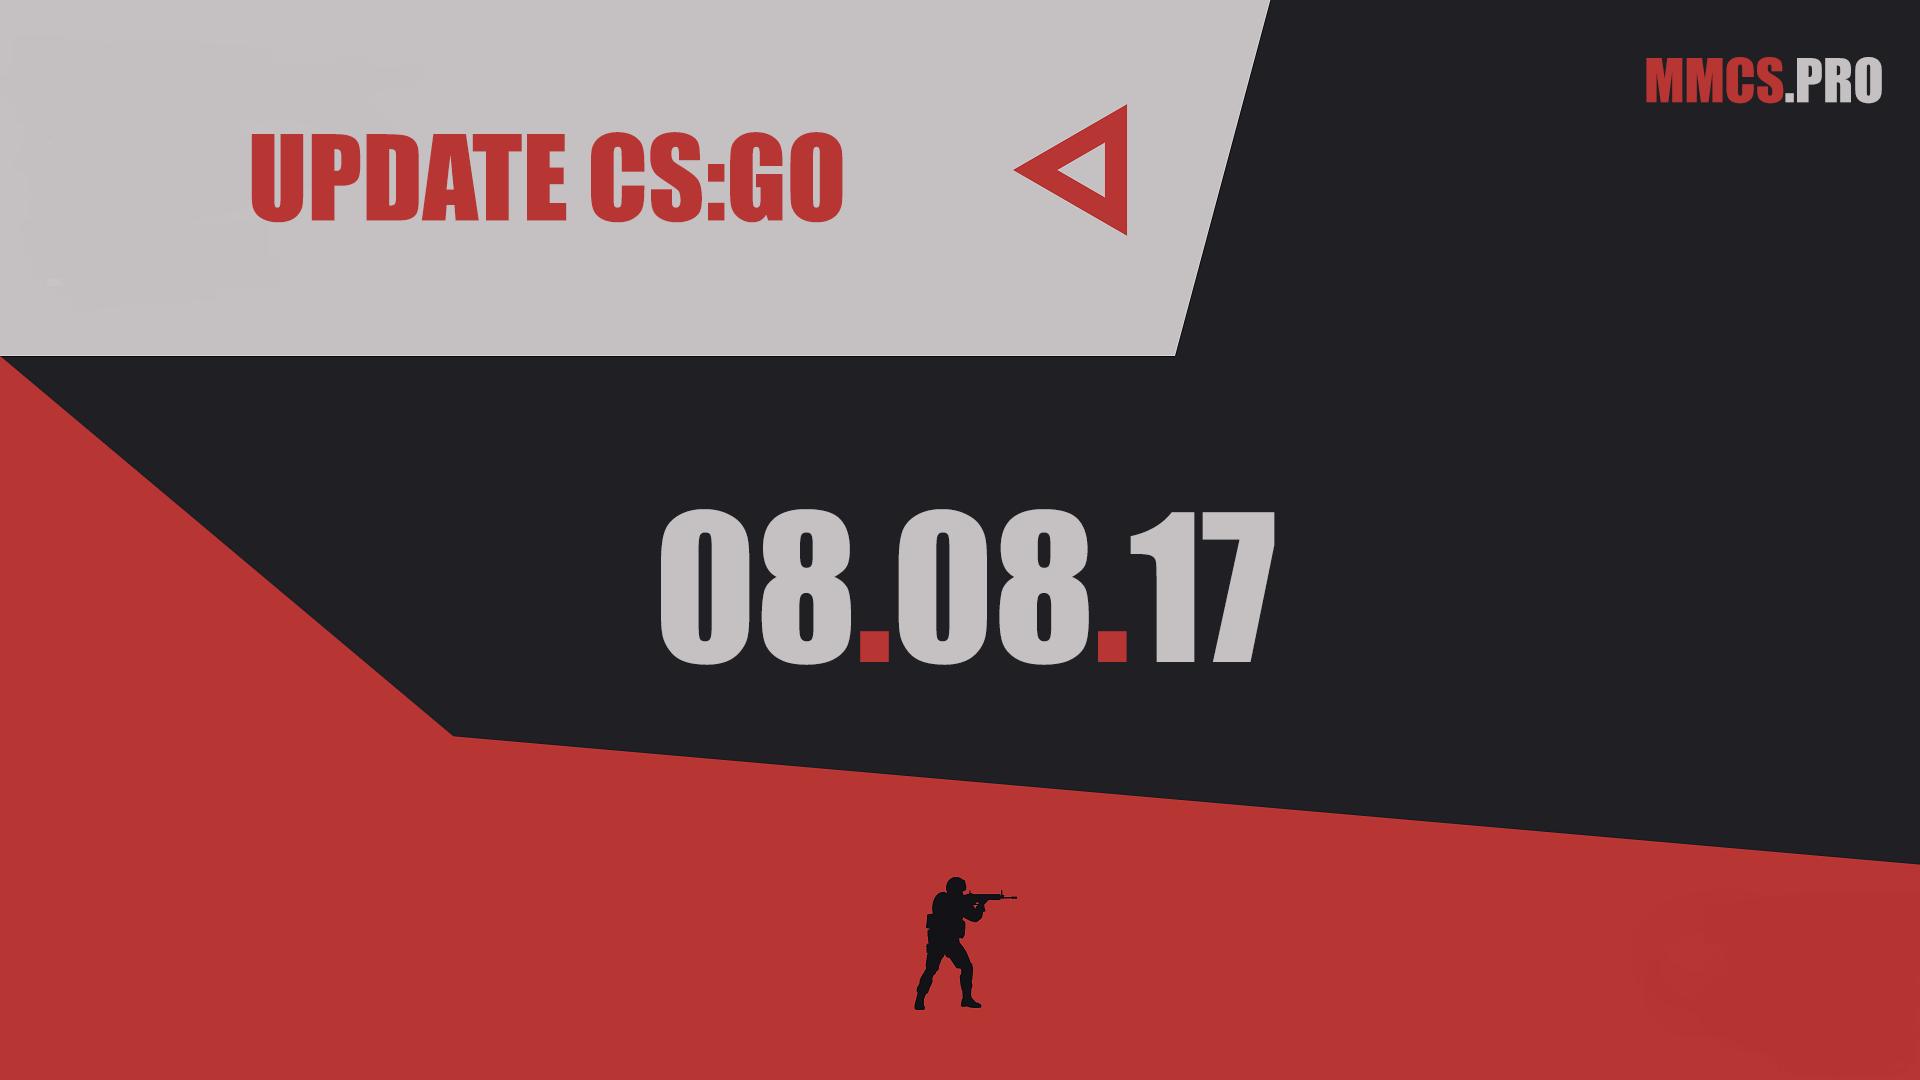 https://mmcs.pro/update-csgo-08-08-2017-valve/